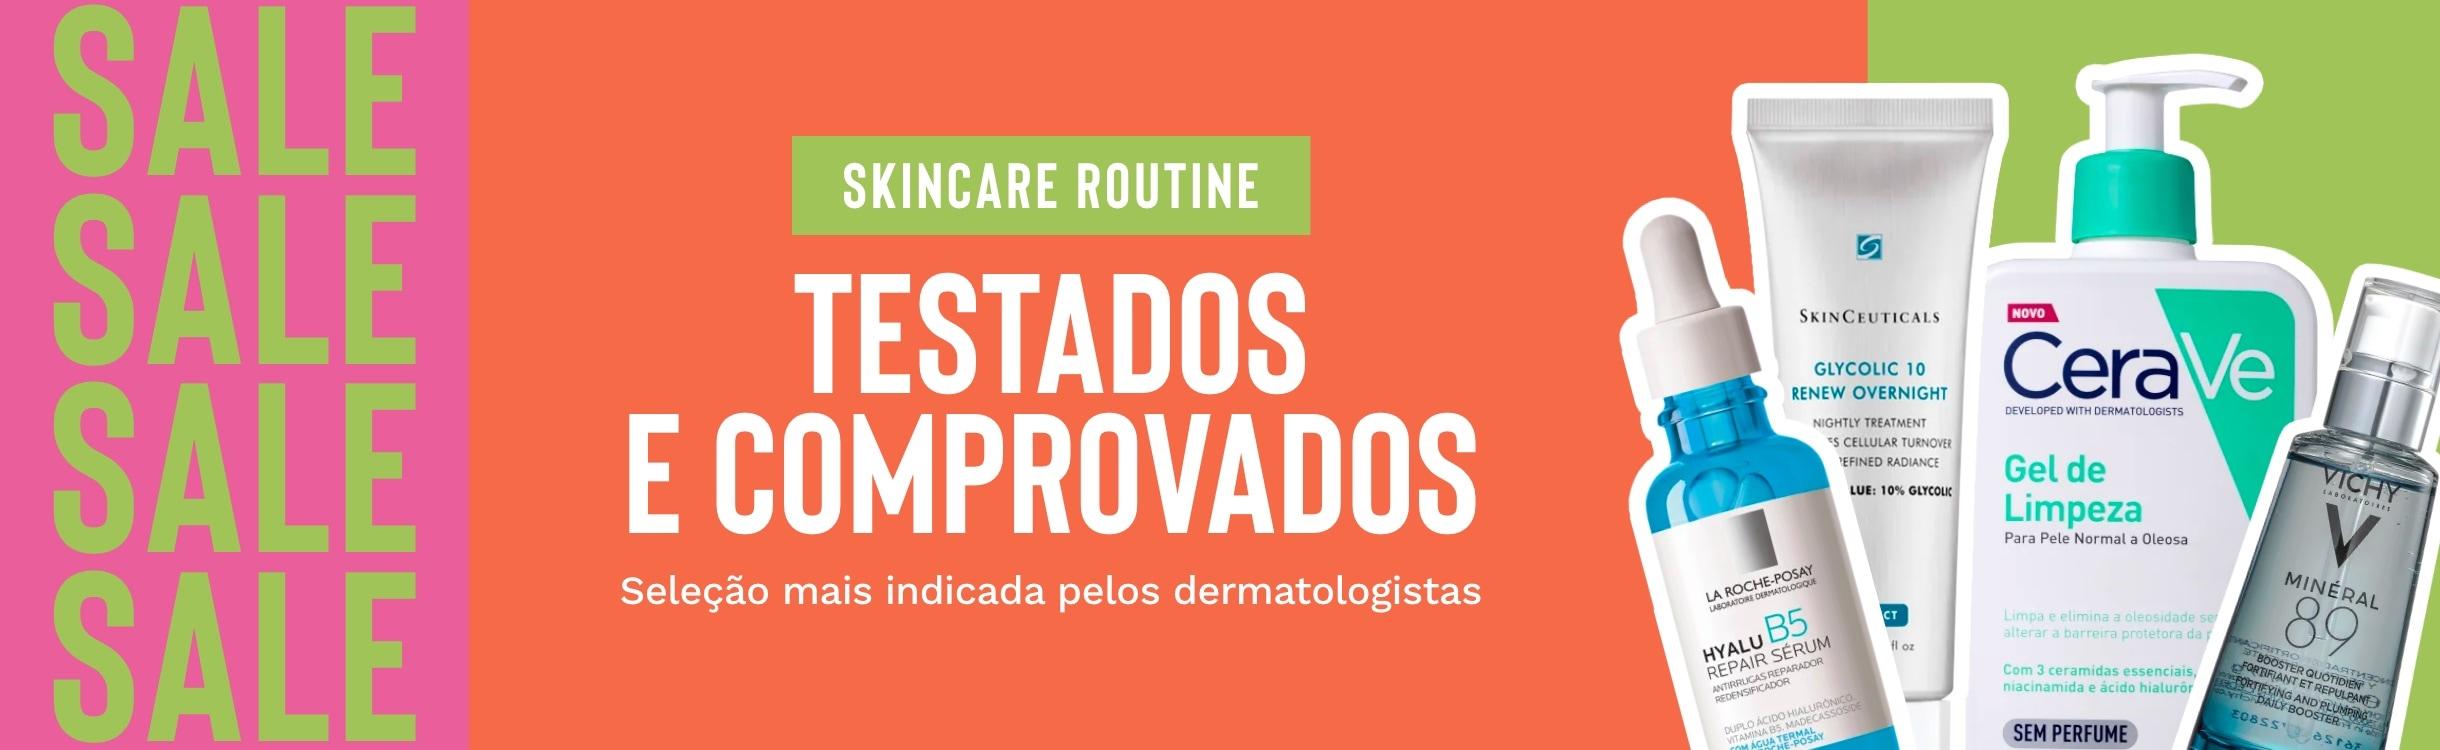 As marcas mais indicadas pelos dermatologistas